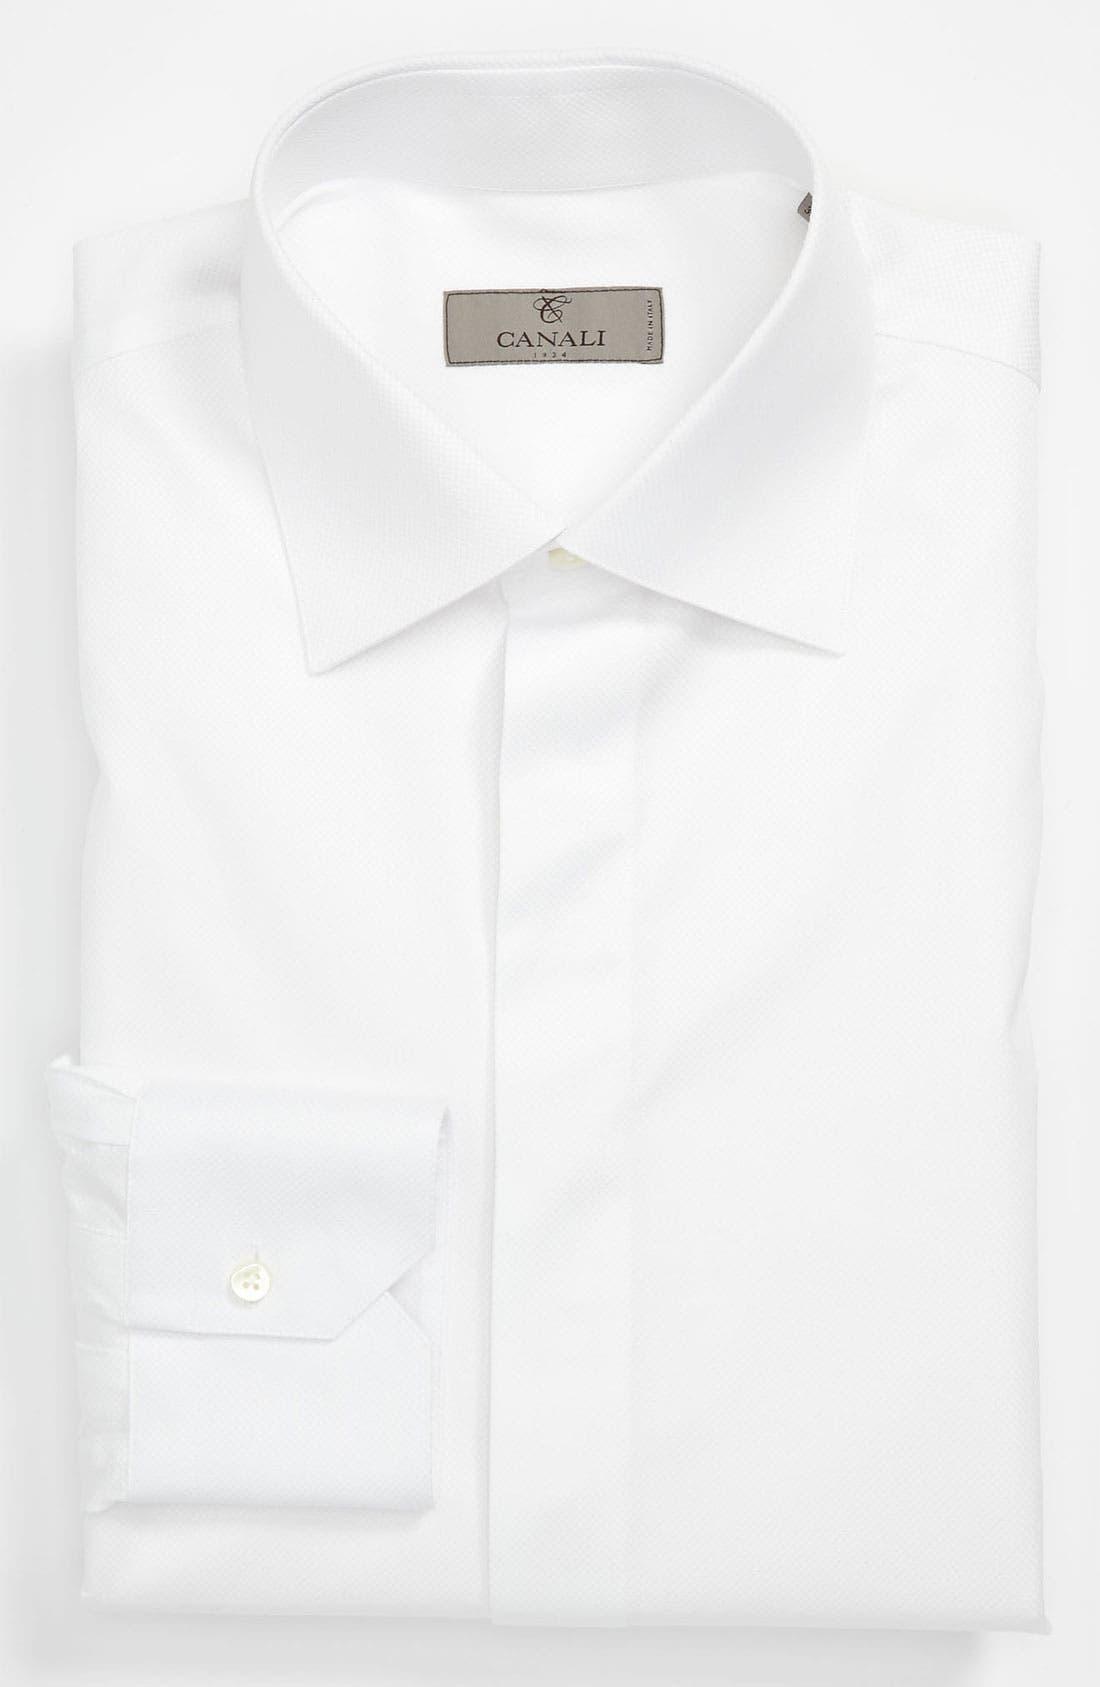 Main Image - Canali Regular Fit Tuxedo Shirt